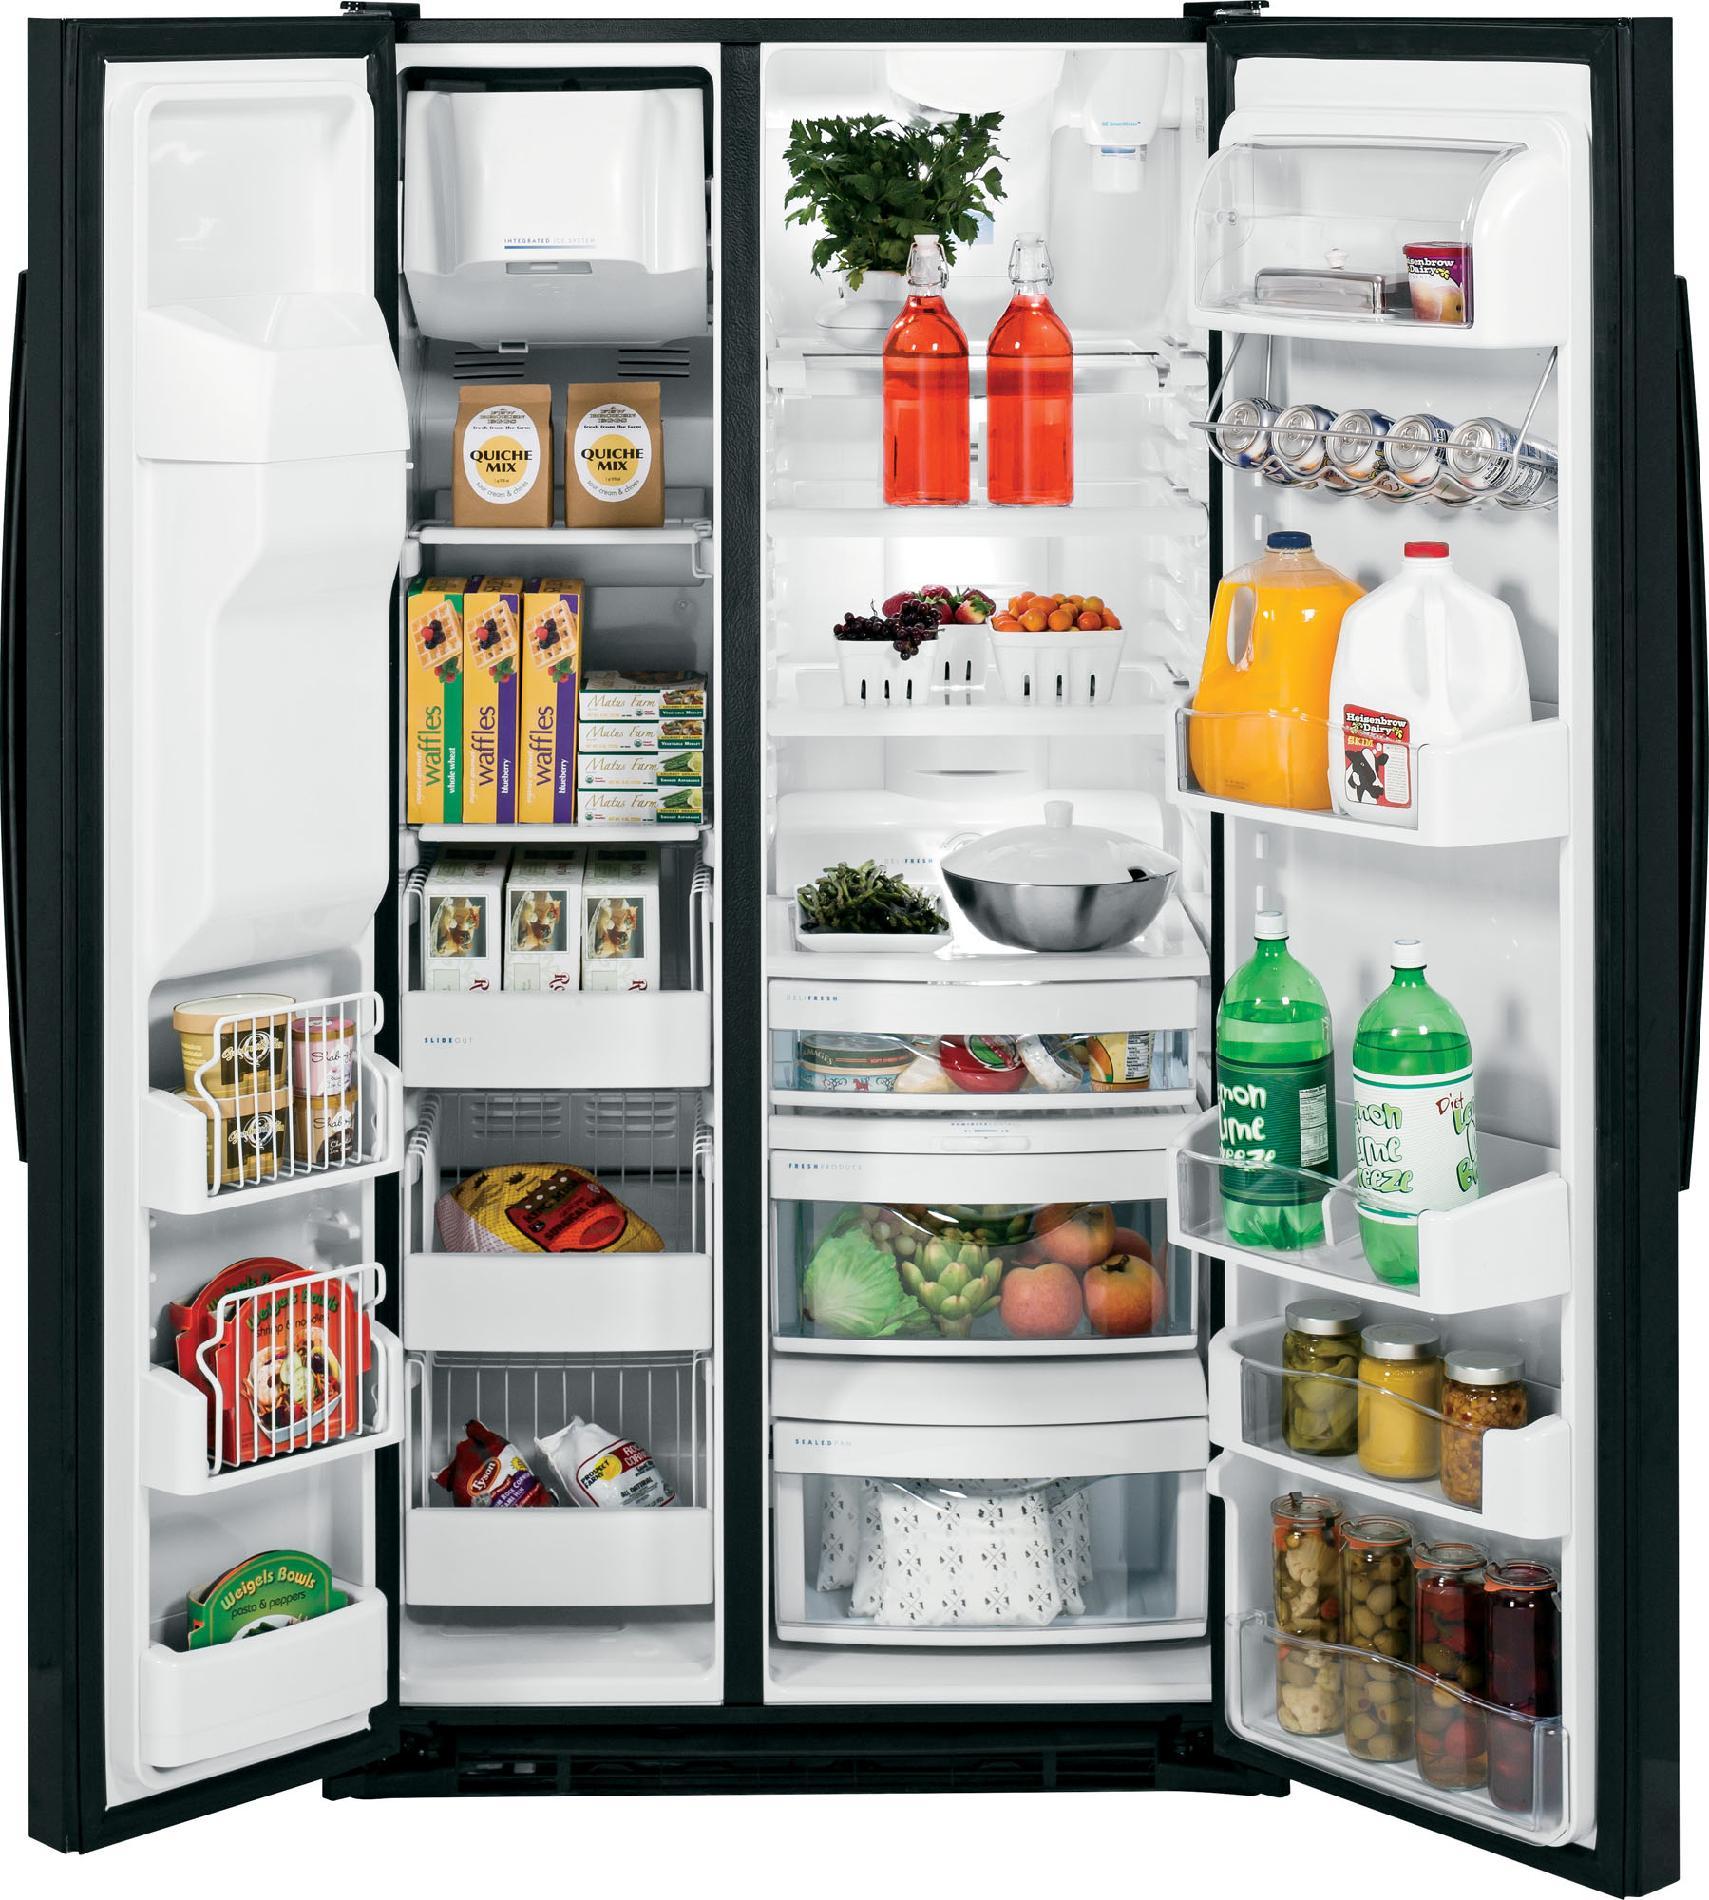 GE Profile 23.3 cu. ft. Counter-Depth Side-by-Side Refrigerator - Black